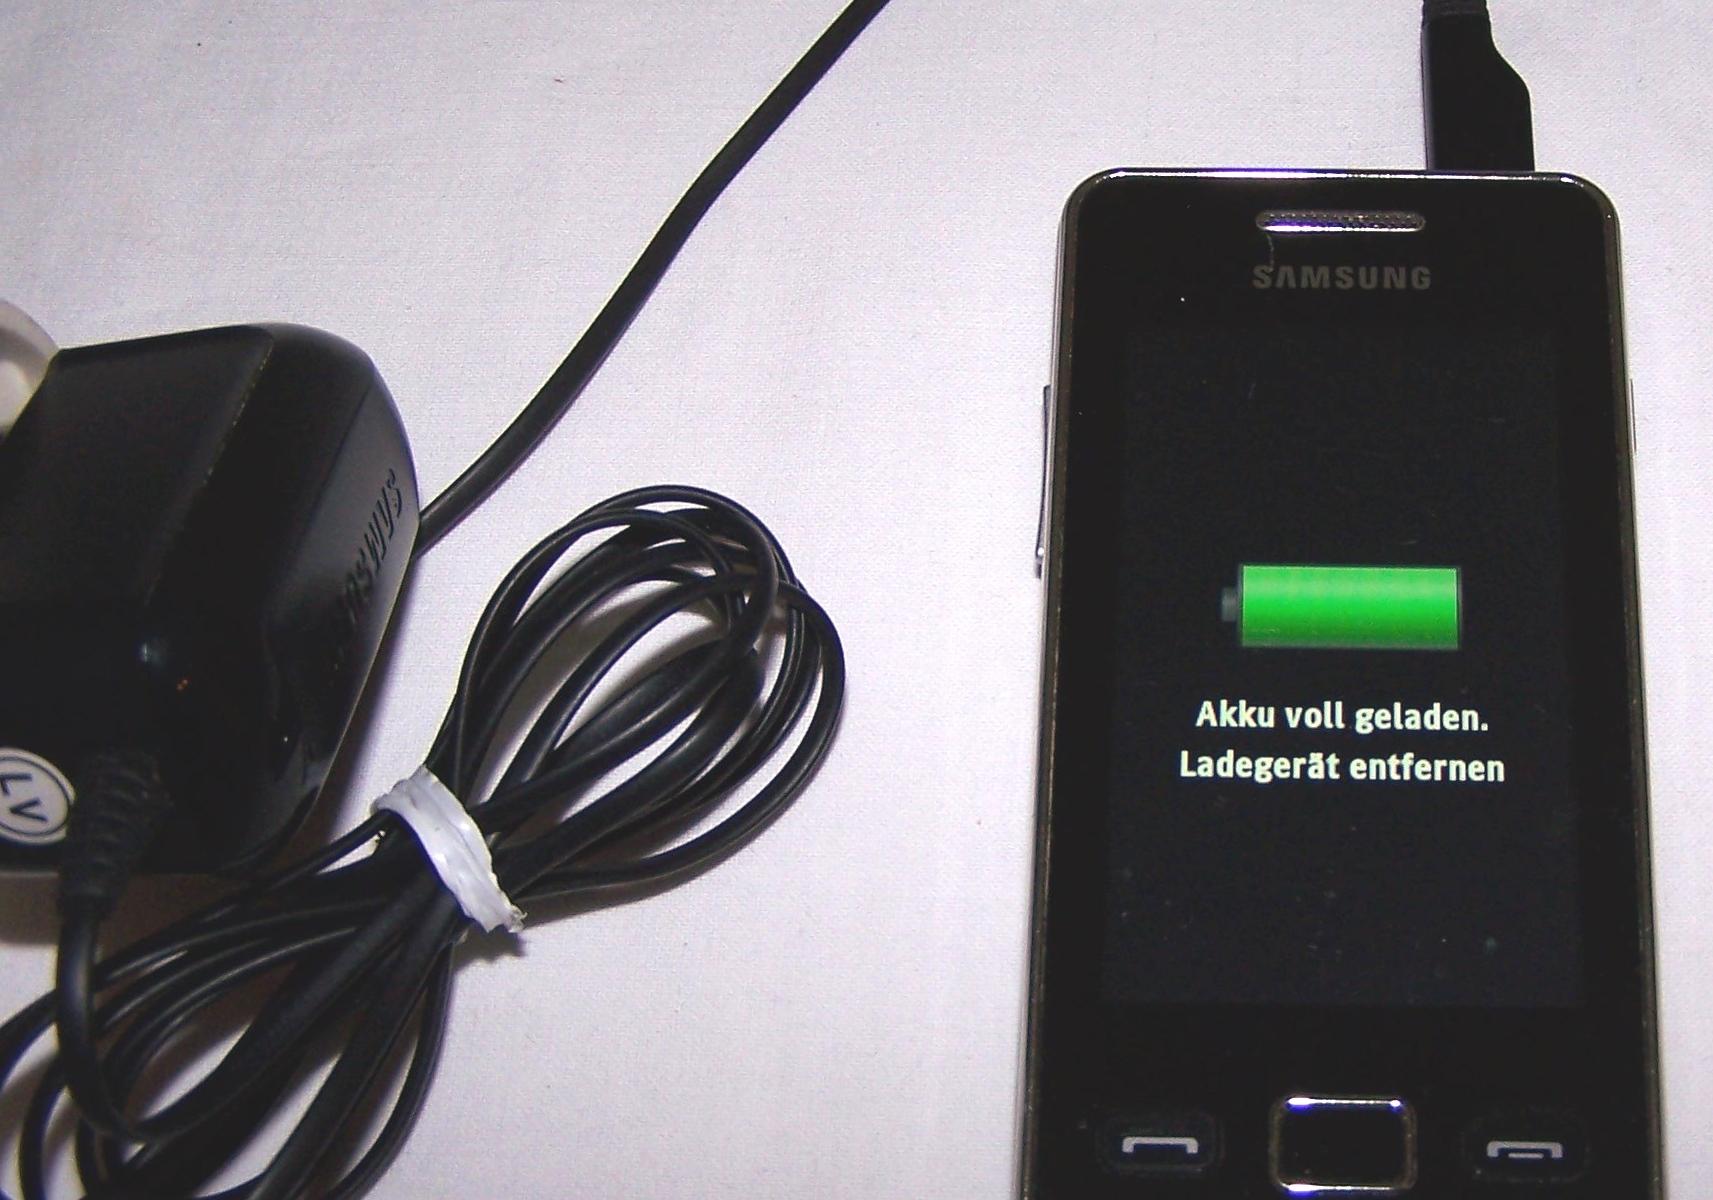 Büro - IT&Kommunikation - Smartphone Samsung GT-S5260